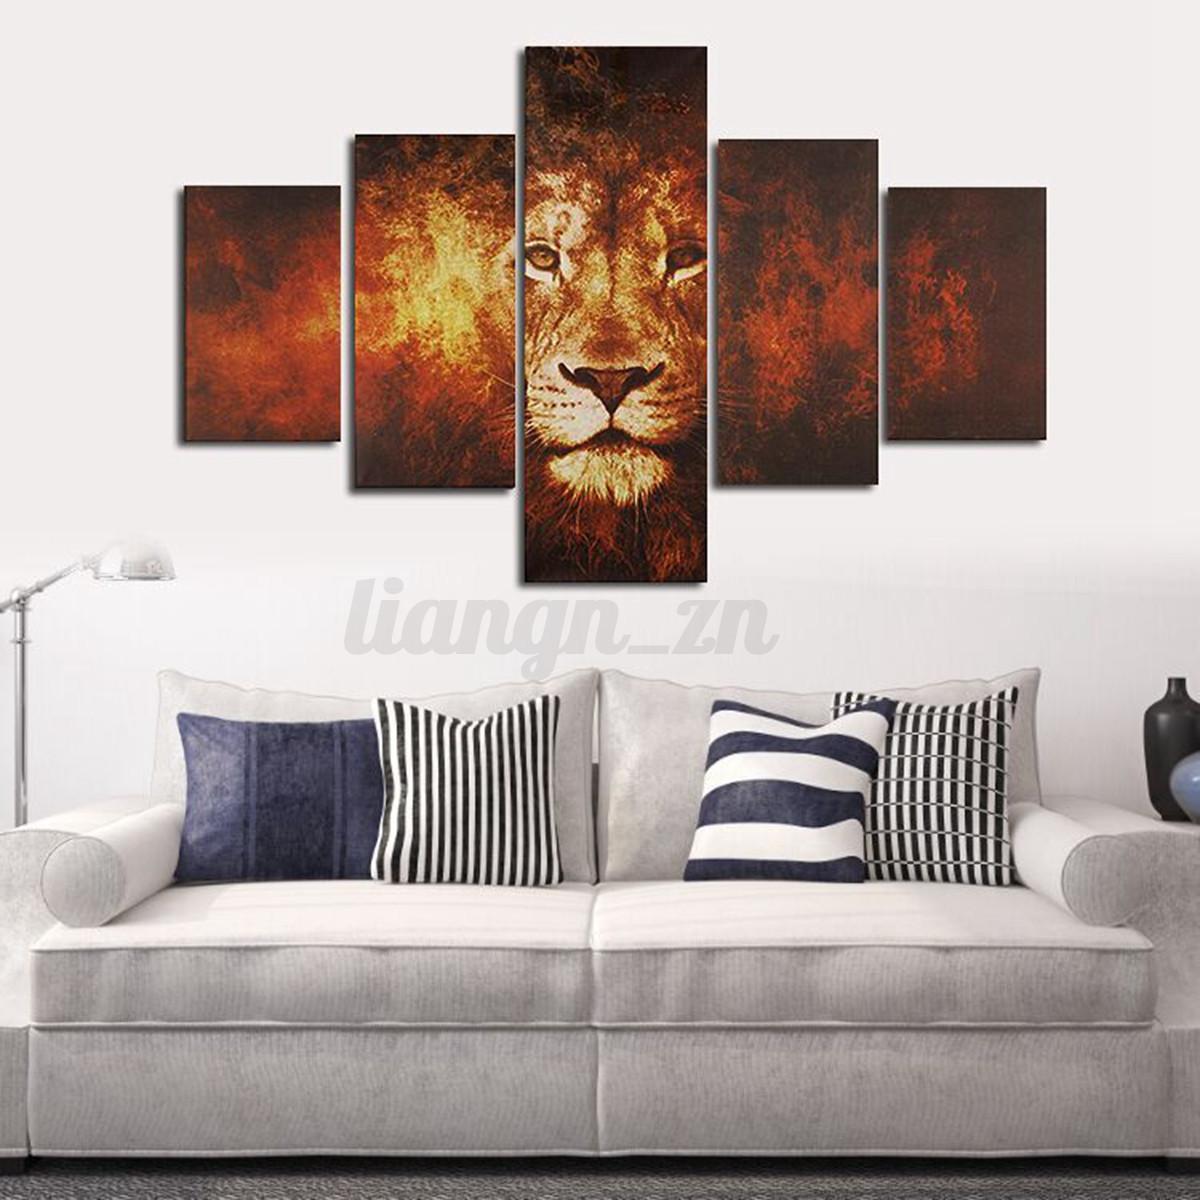 Superior No Frame Large Canvas Modern Home Wall Decor